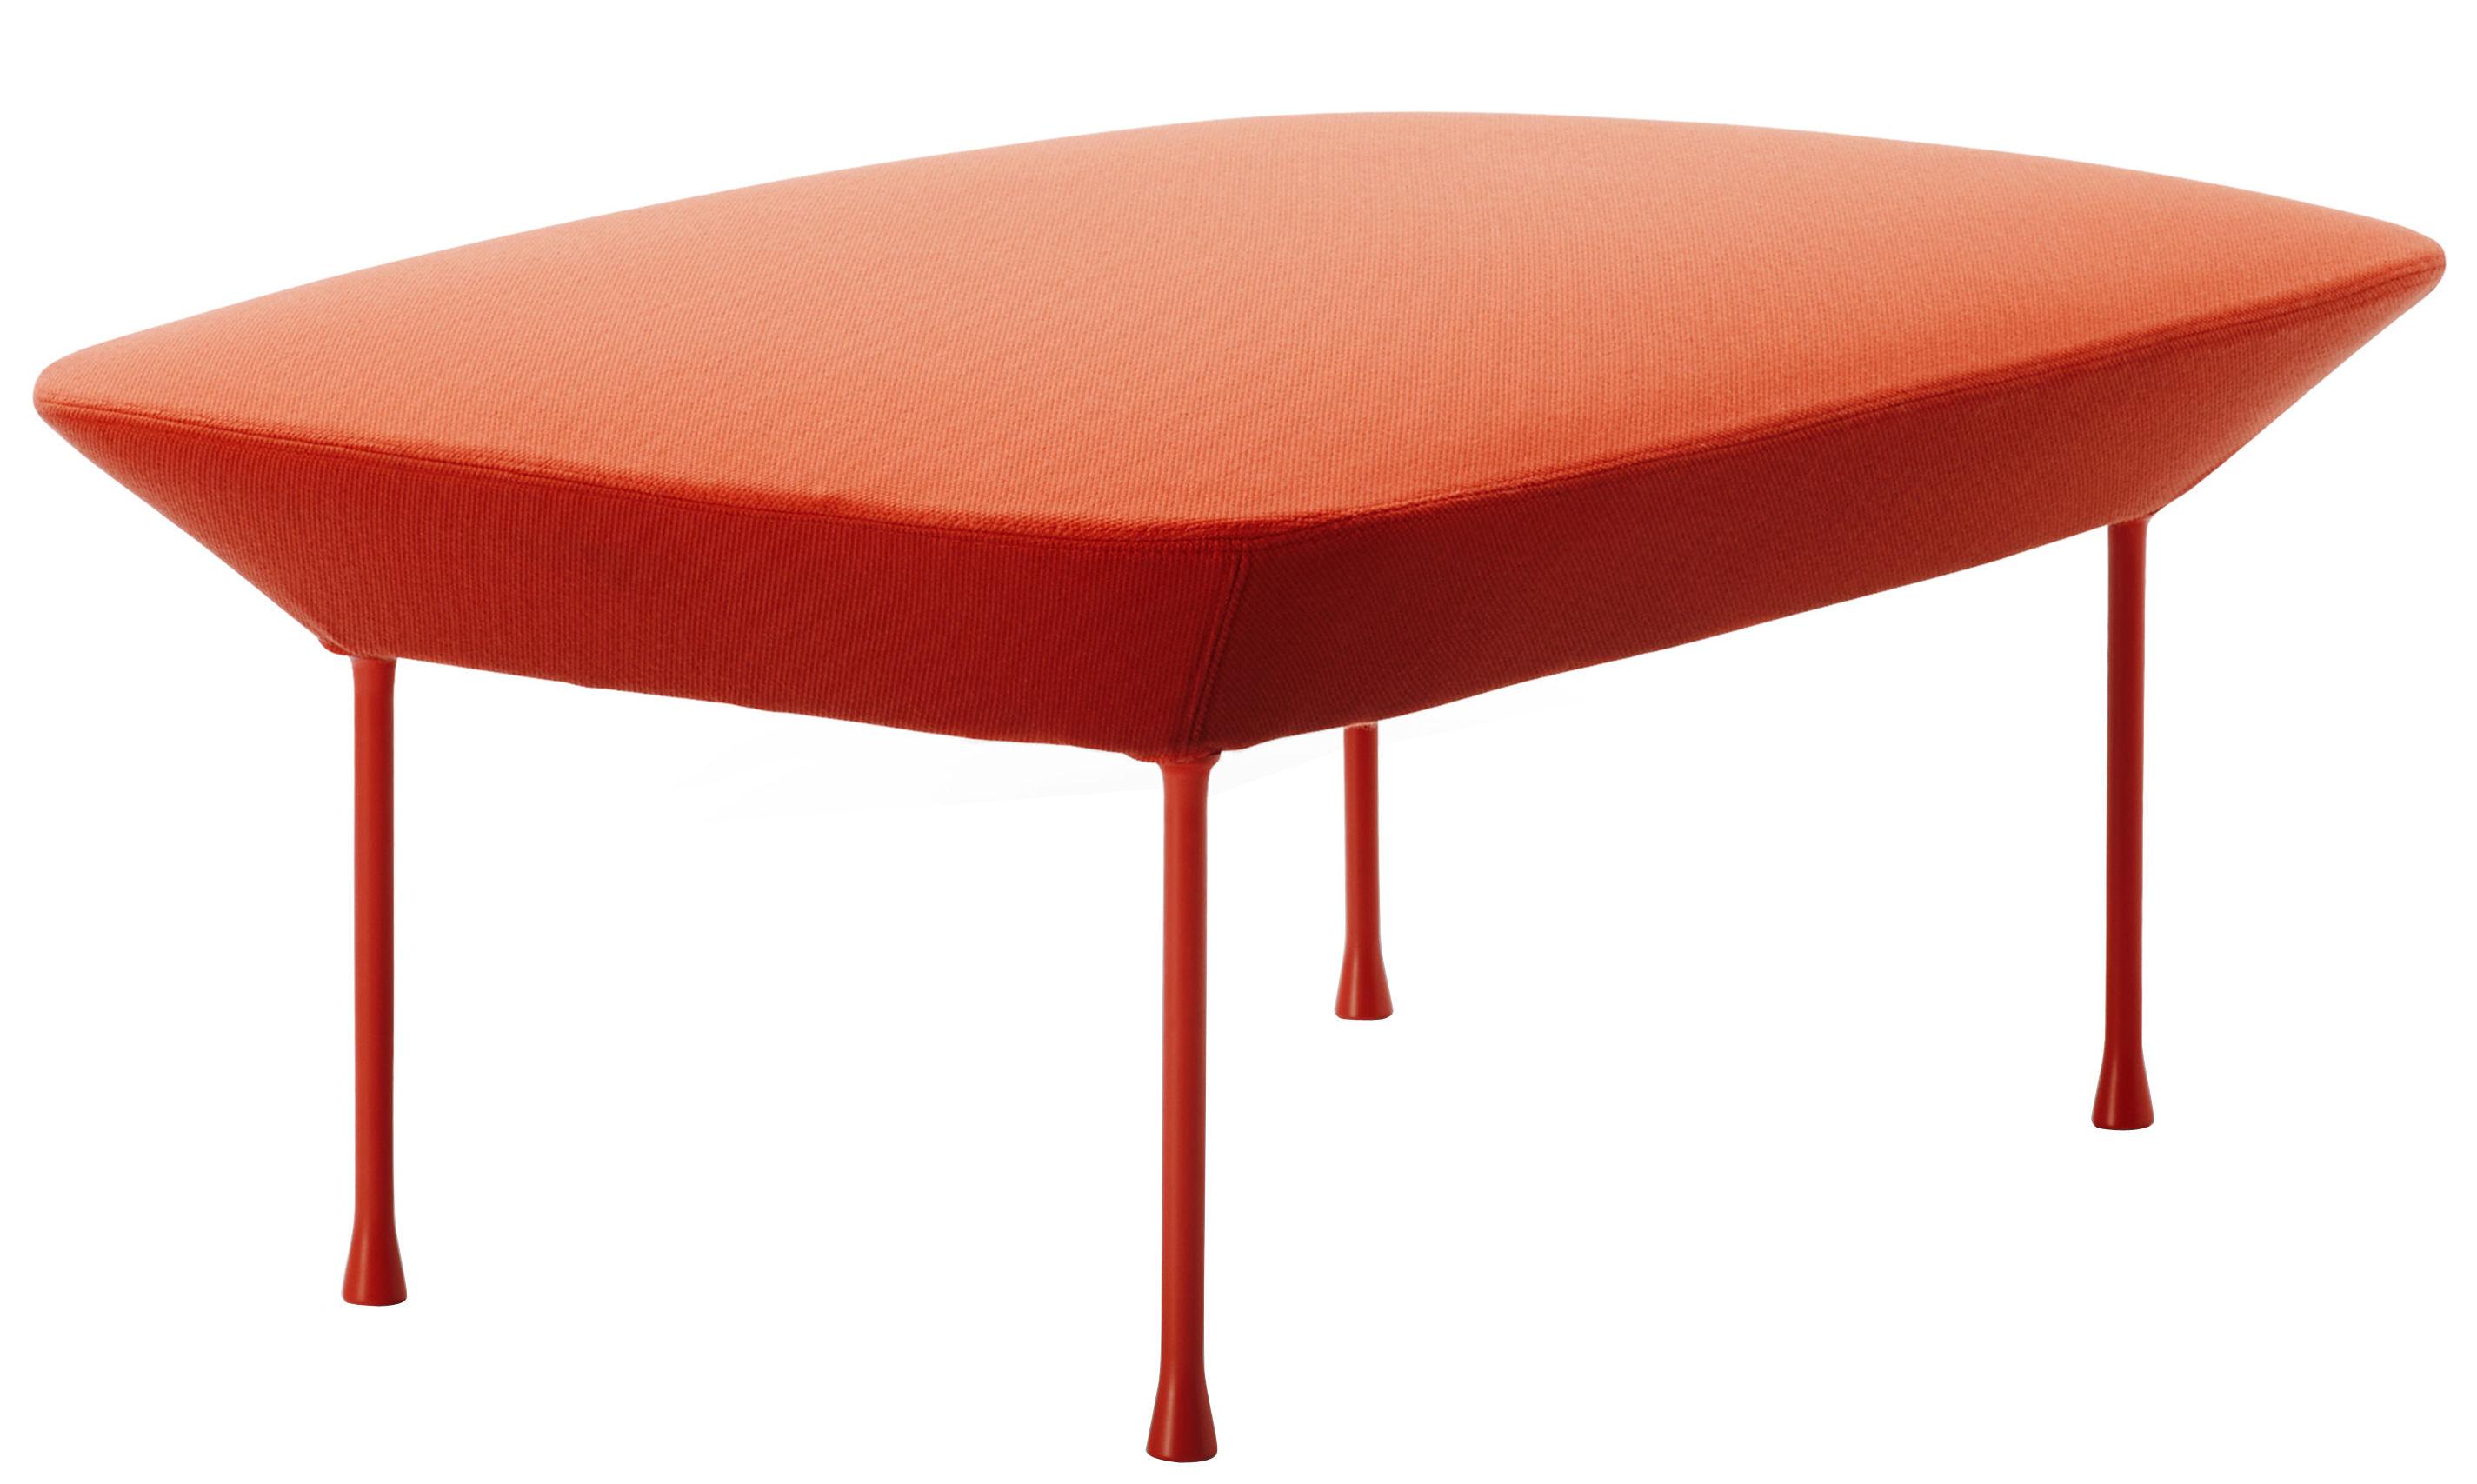 Möbel - Sitzkissen - Oslo Sitzkissen / 100 x 73 cm - Muuto - Mandarine - Aluminium, Kvadrat-Gewebe, Schaumstoff, Stahl